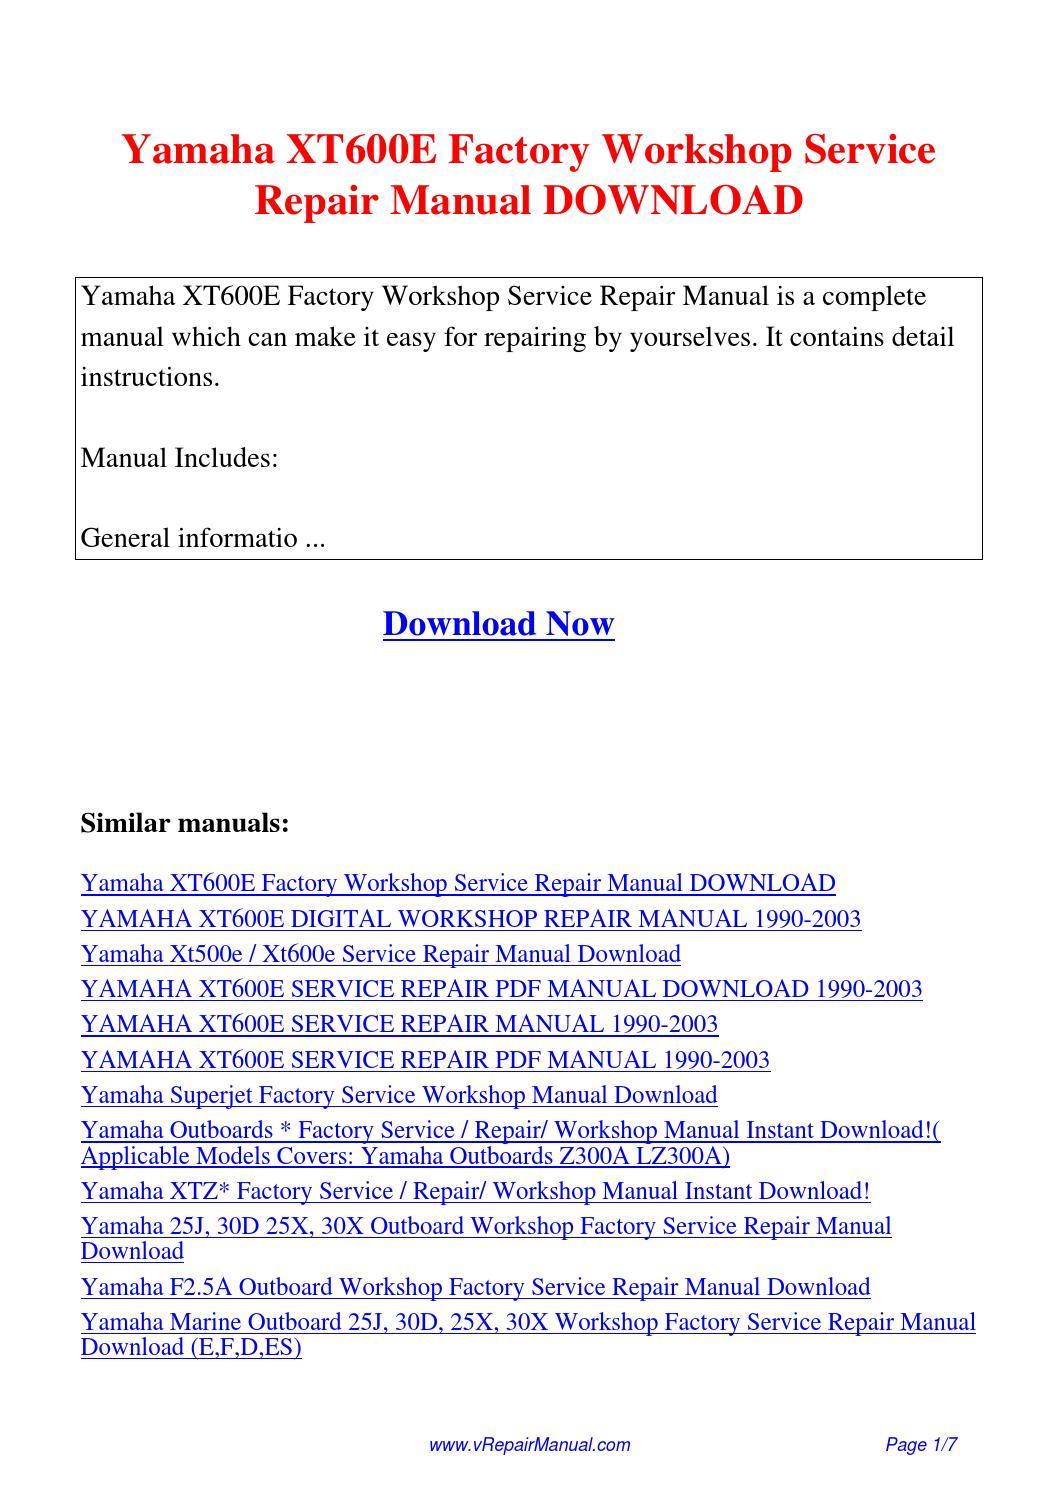 Yamaha XT600E Factory Workshop Service Repair Manual.pdf by David Zhang -  issuu